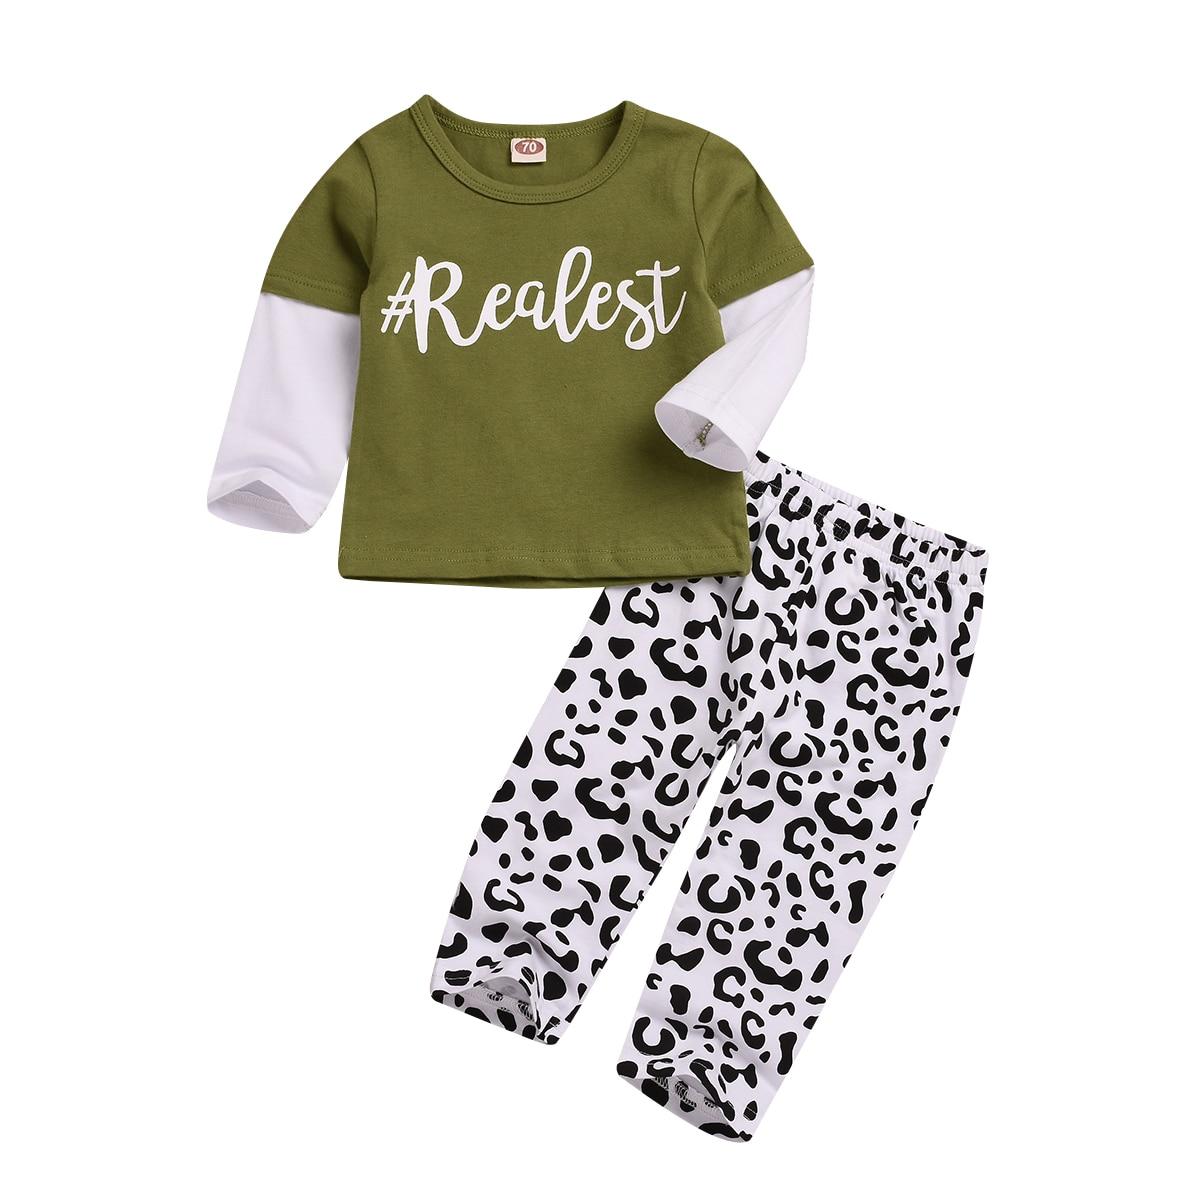 US Newborn Baby Boy Girl Long Sleeve Top T-shirt+Pants 2pcs Outfits Clothes Set